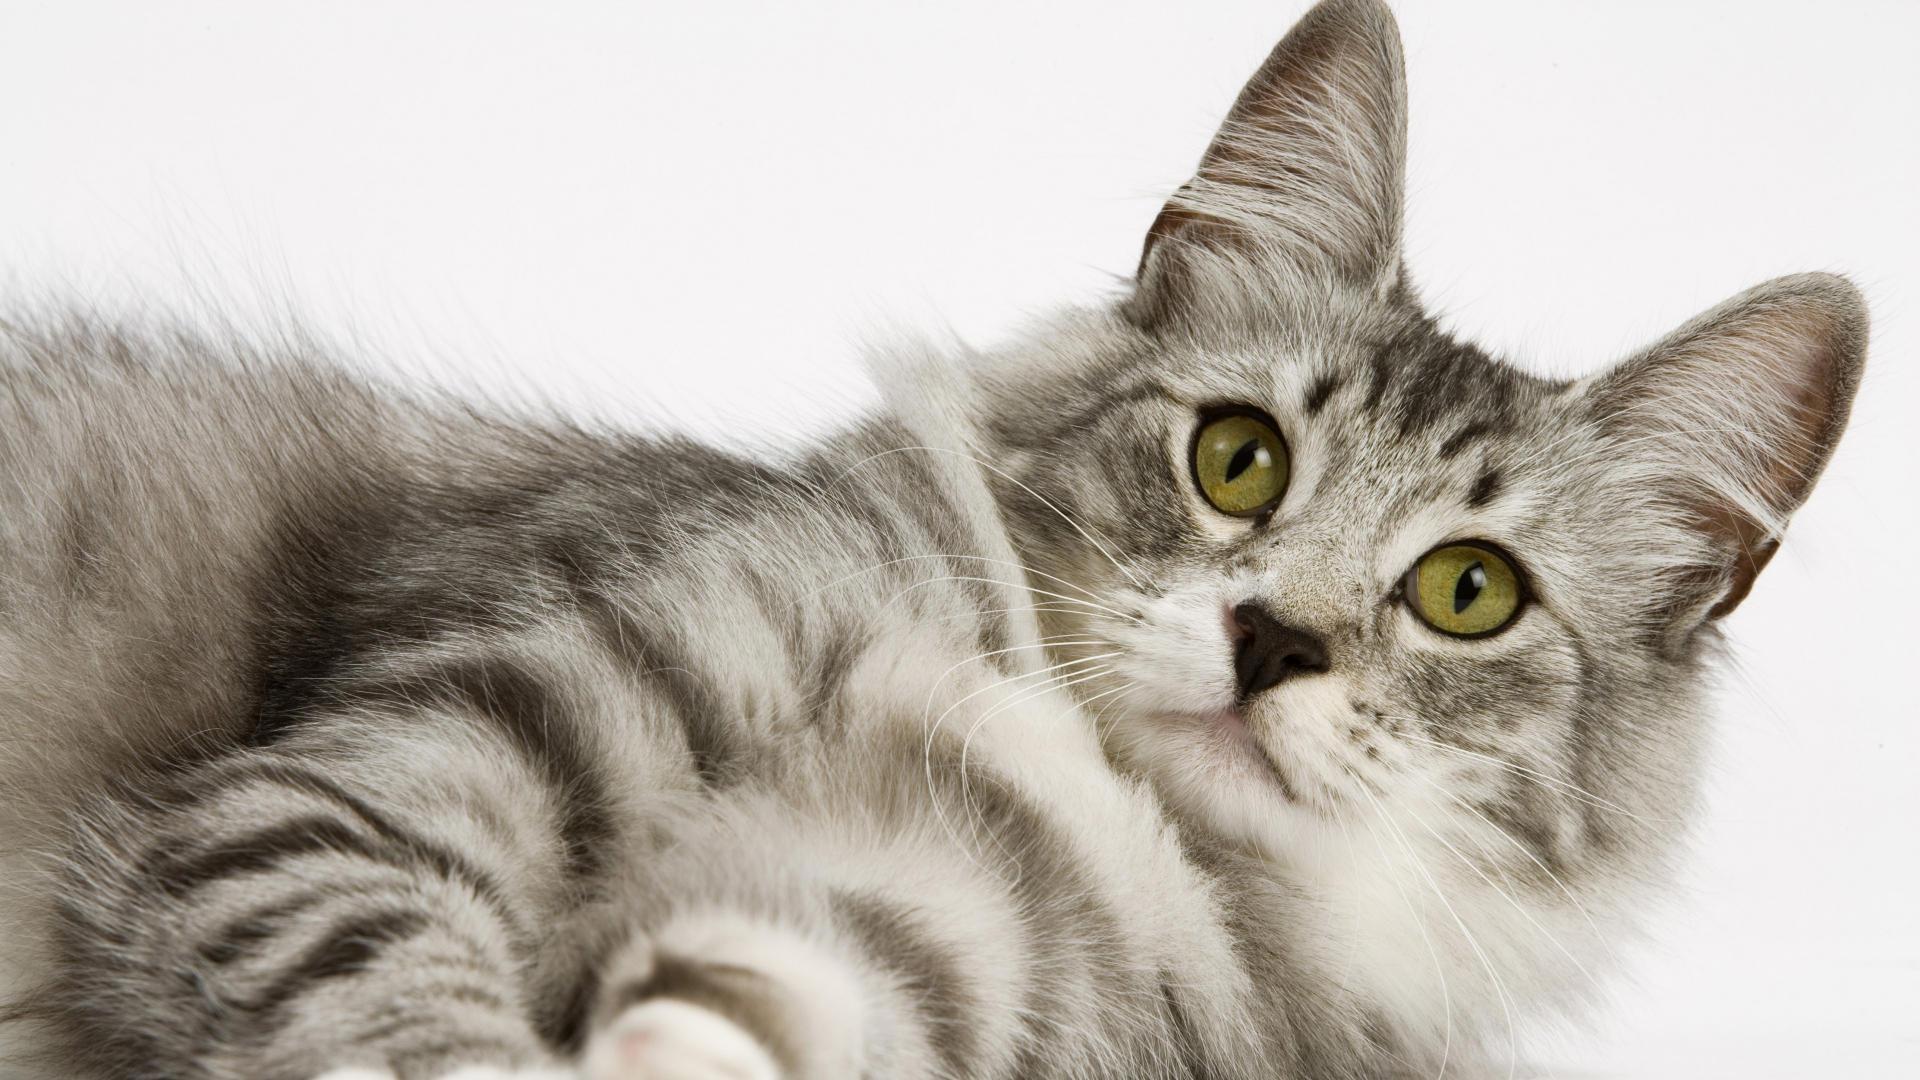 Cool-cat-wallpaper-free-download